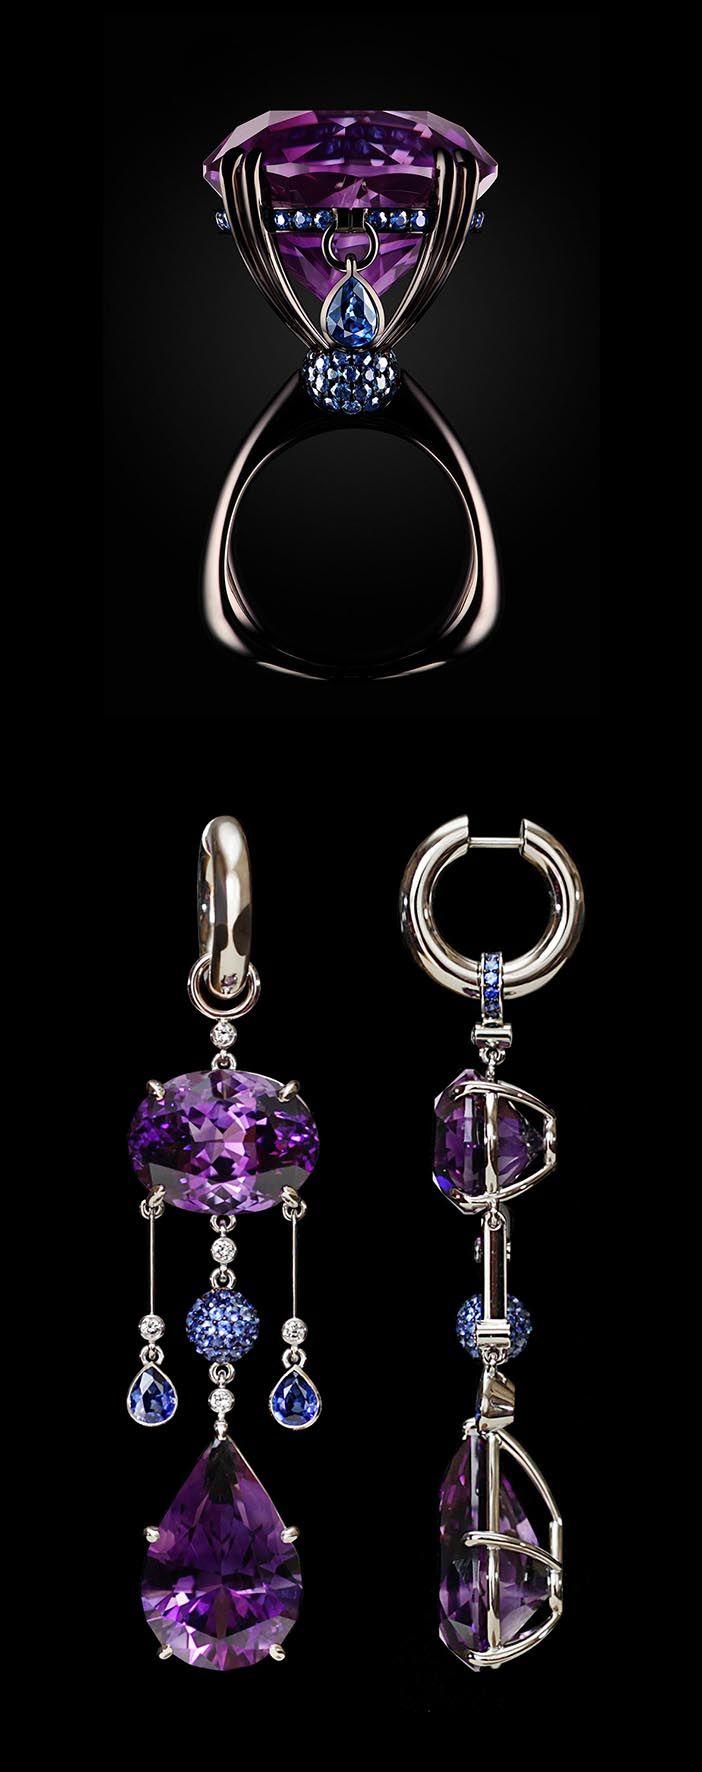 "VLAD GLYNIN jewellery - Ring and earrings set ""Dew-Iris"", 2012. White gold, amethysts, sapphires. / Кольцо и серьги ""Роса-ирис"", 2012 г. Белое золото, аметисты, сапфиры. / Anello e orecchini ""Rugiada-iris"", 2012. Oro bianco, ametiste, zaffiri."